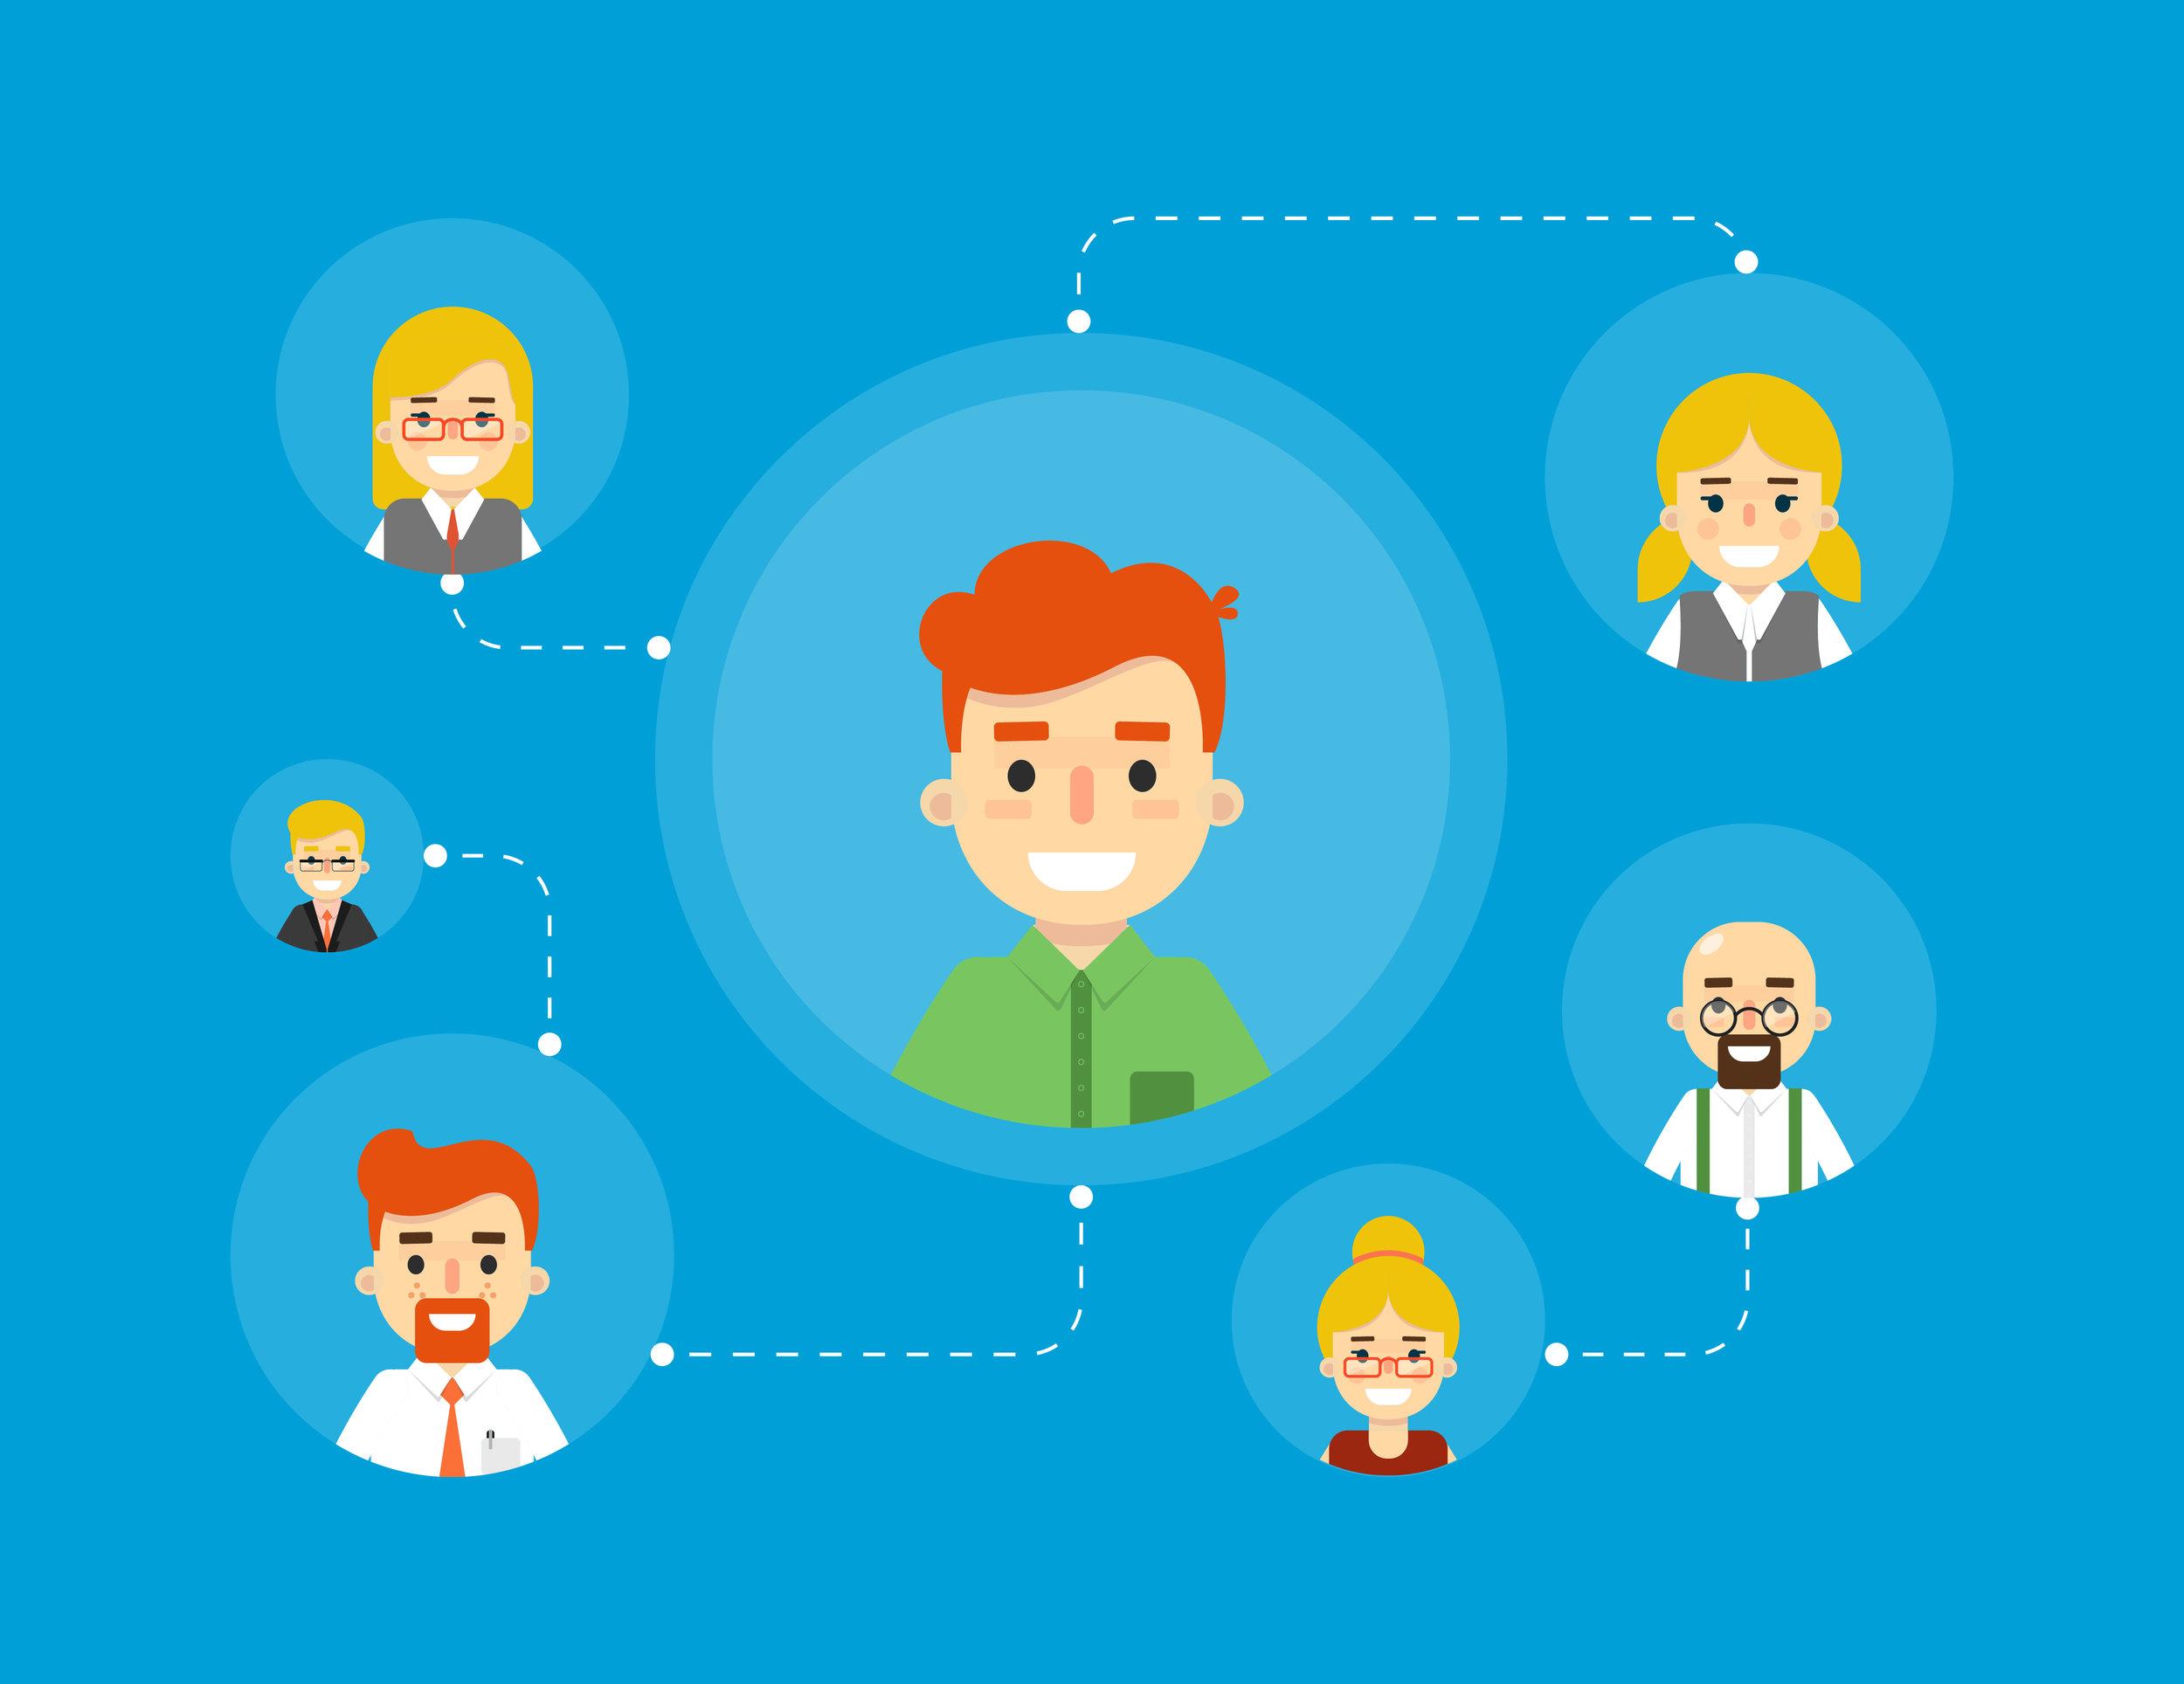 Social Networking illustration-01.jpg